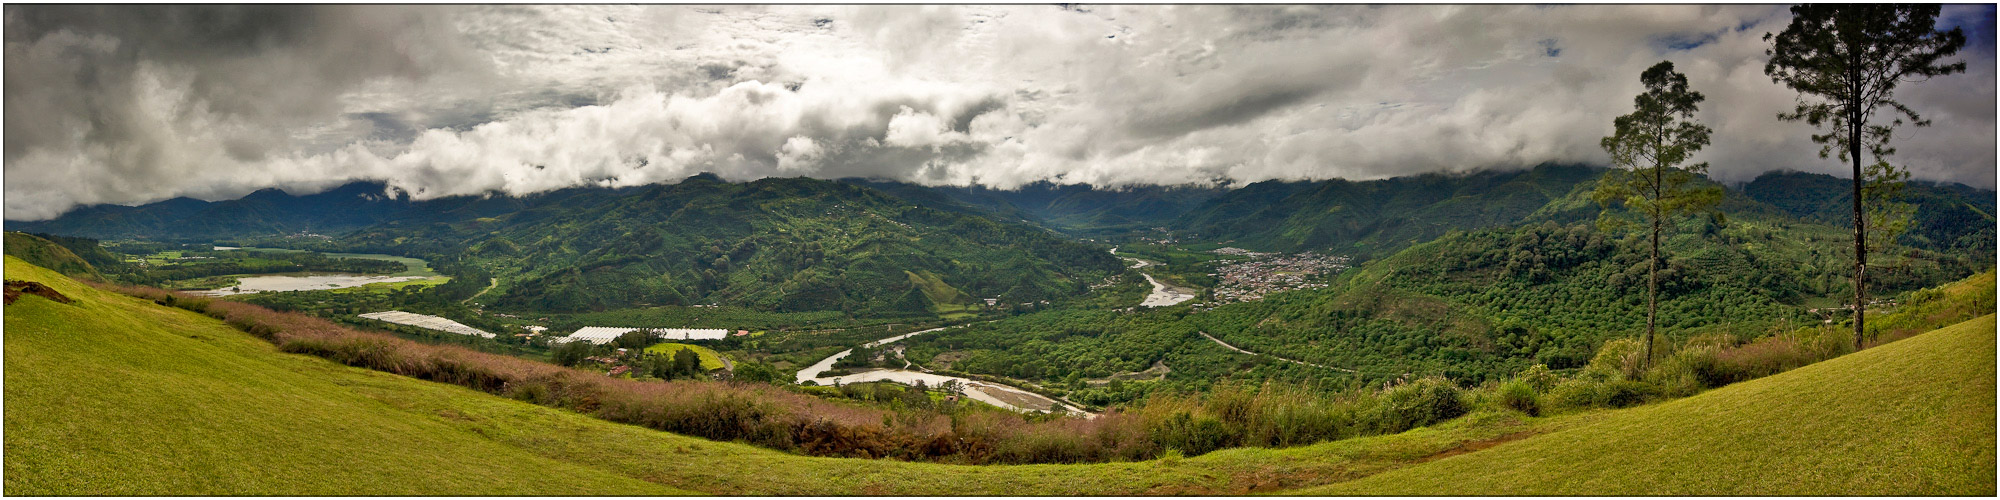 Orosi Valley - Costa Rica